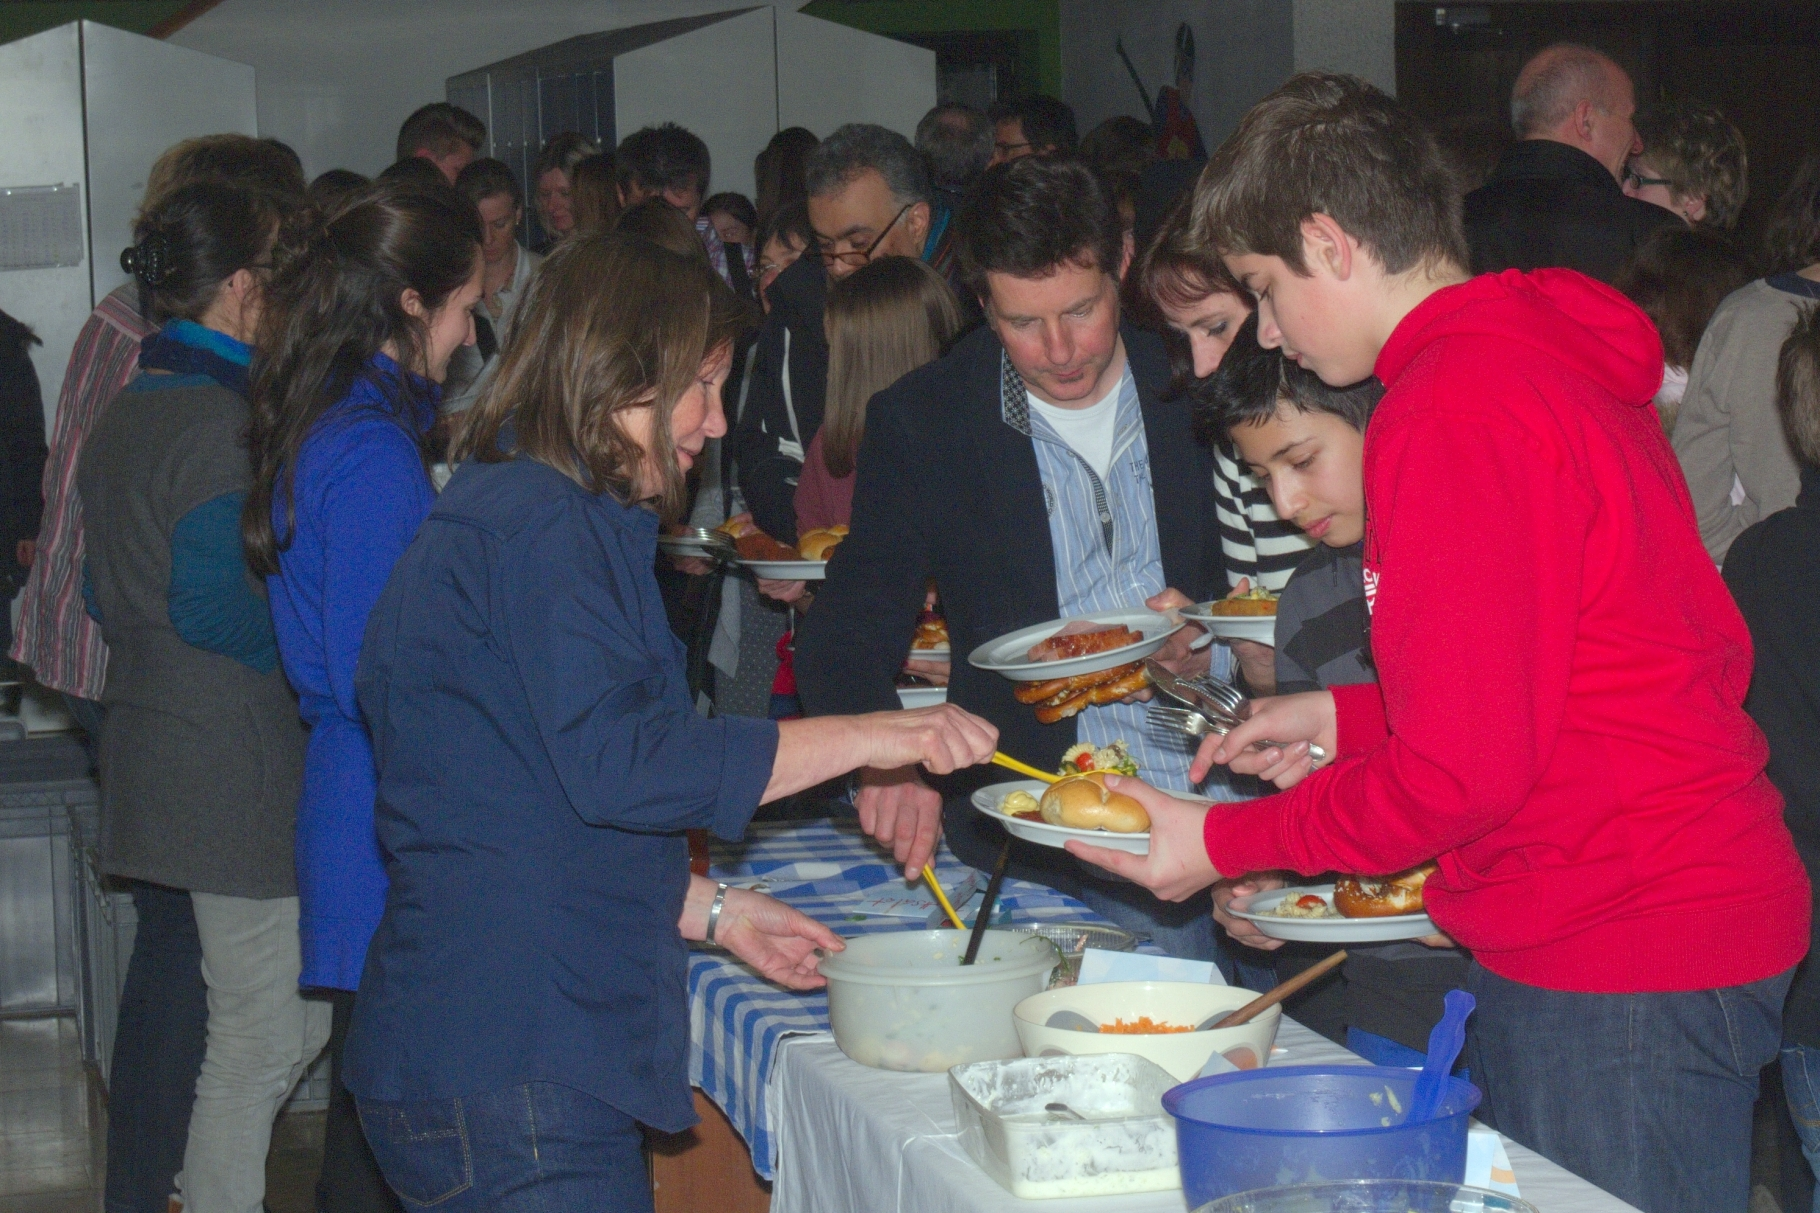 change in - Abschlussfest Barbarasaal Stetten-Institut - Guten Appetit! - Foto: Robert Hösle - Freiwilligen-Zentrum Augsburg